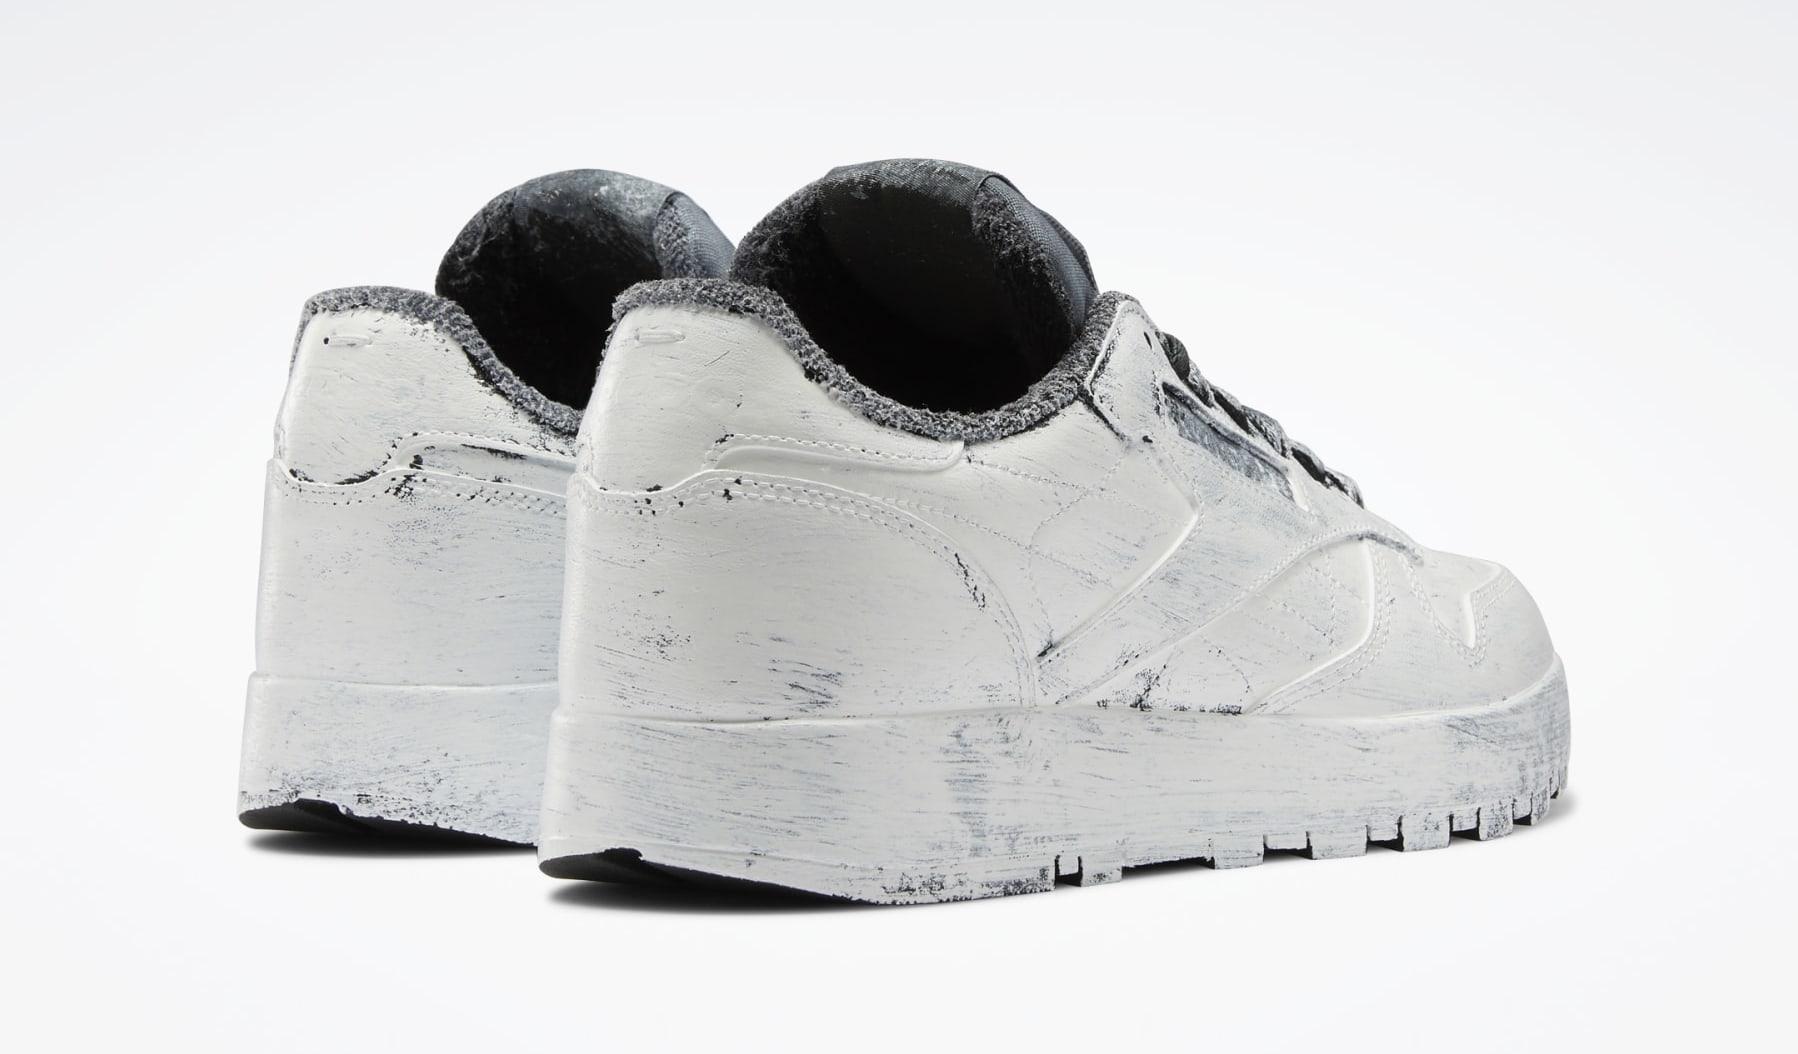 Maison Margiela x Reebok Classic Leather Tabi H04859 Heel